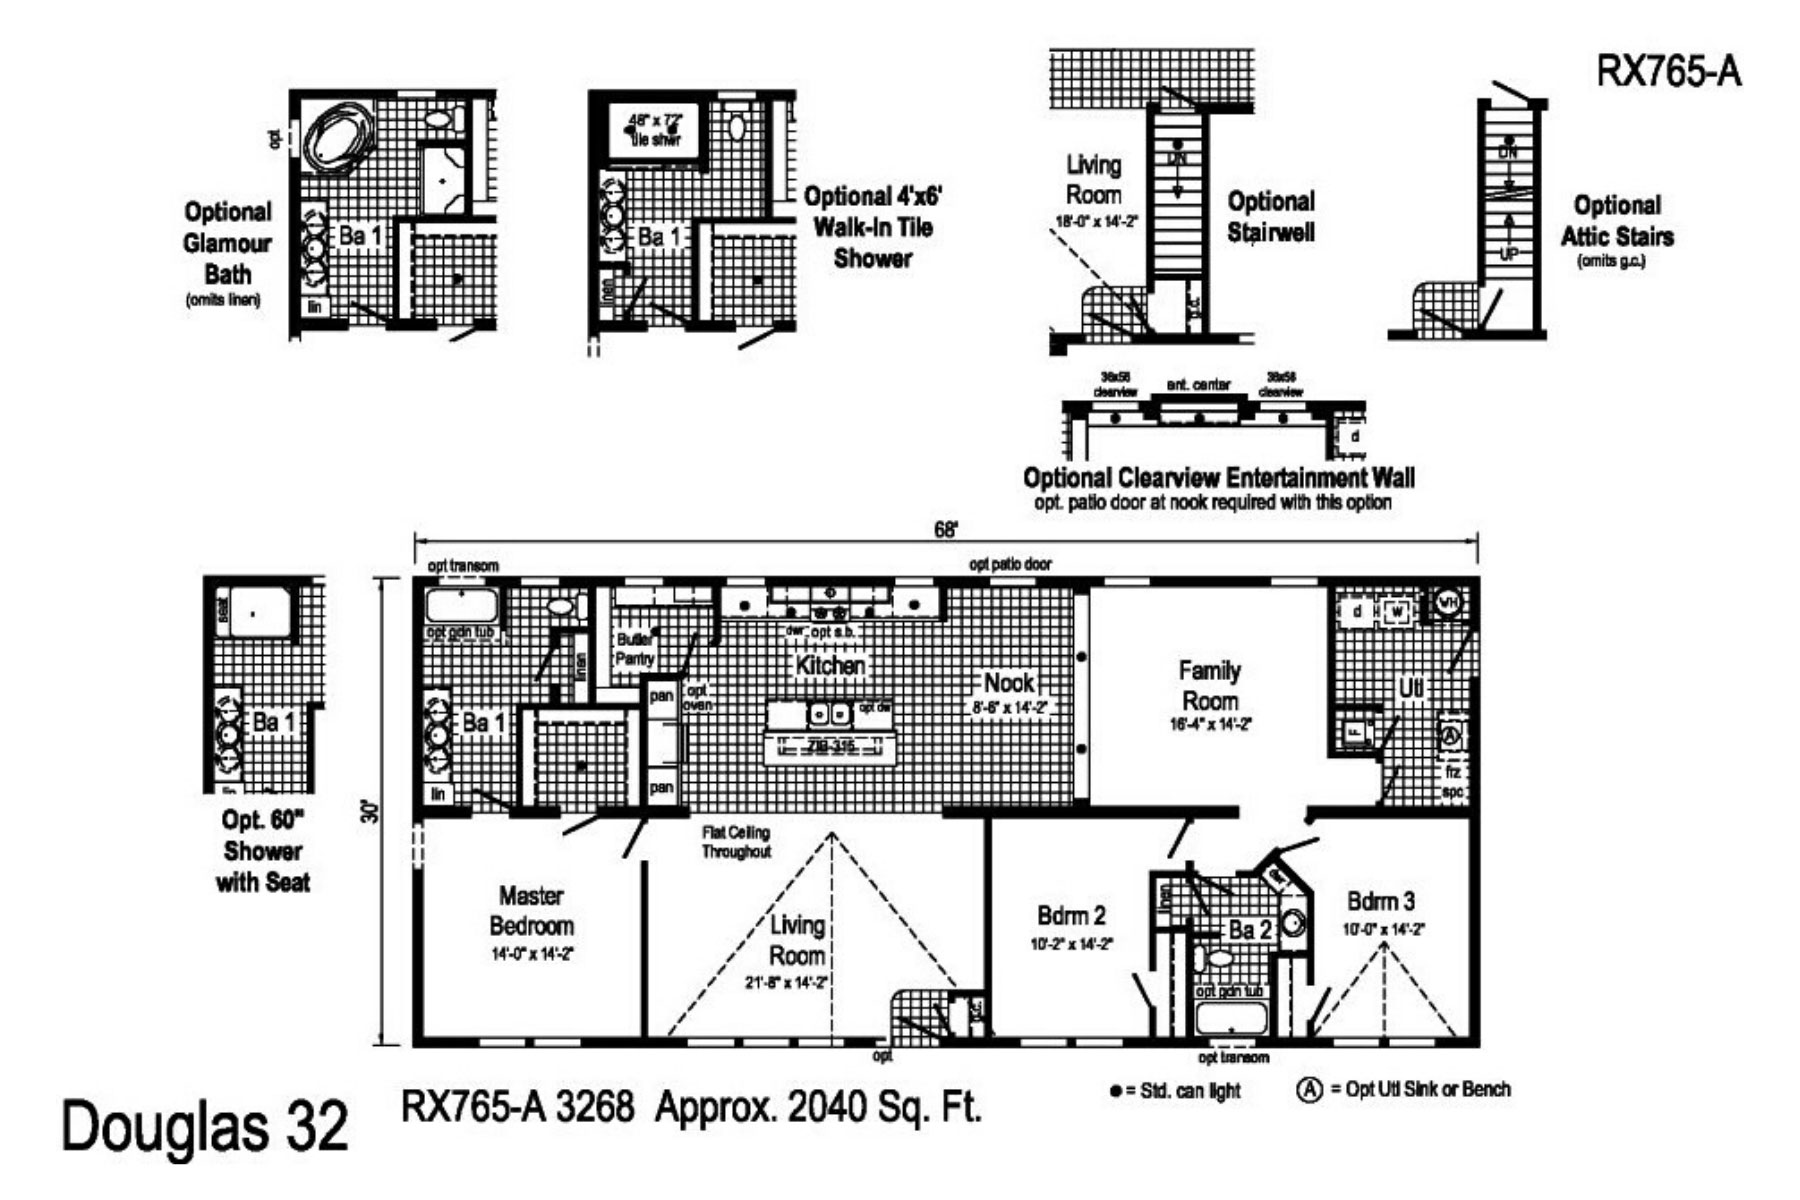 Commodore-Douglas--RX-765-Manufacturer-Floor-Plan-1